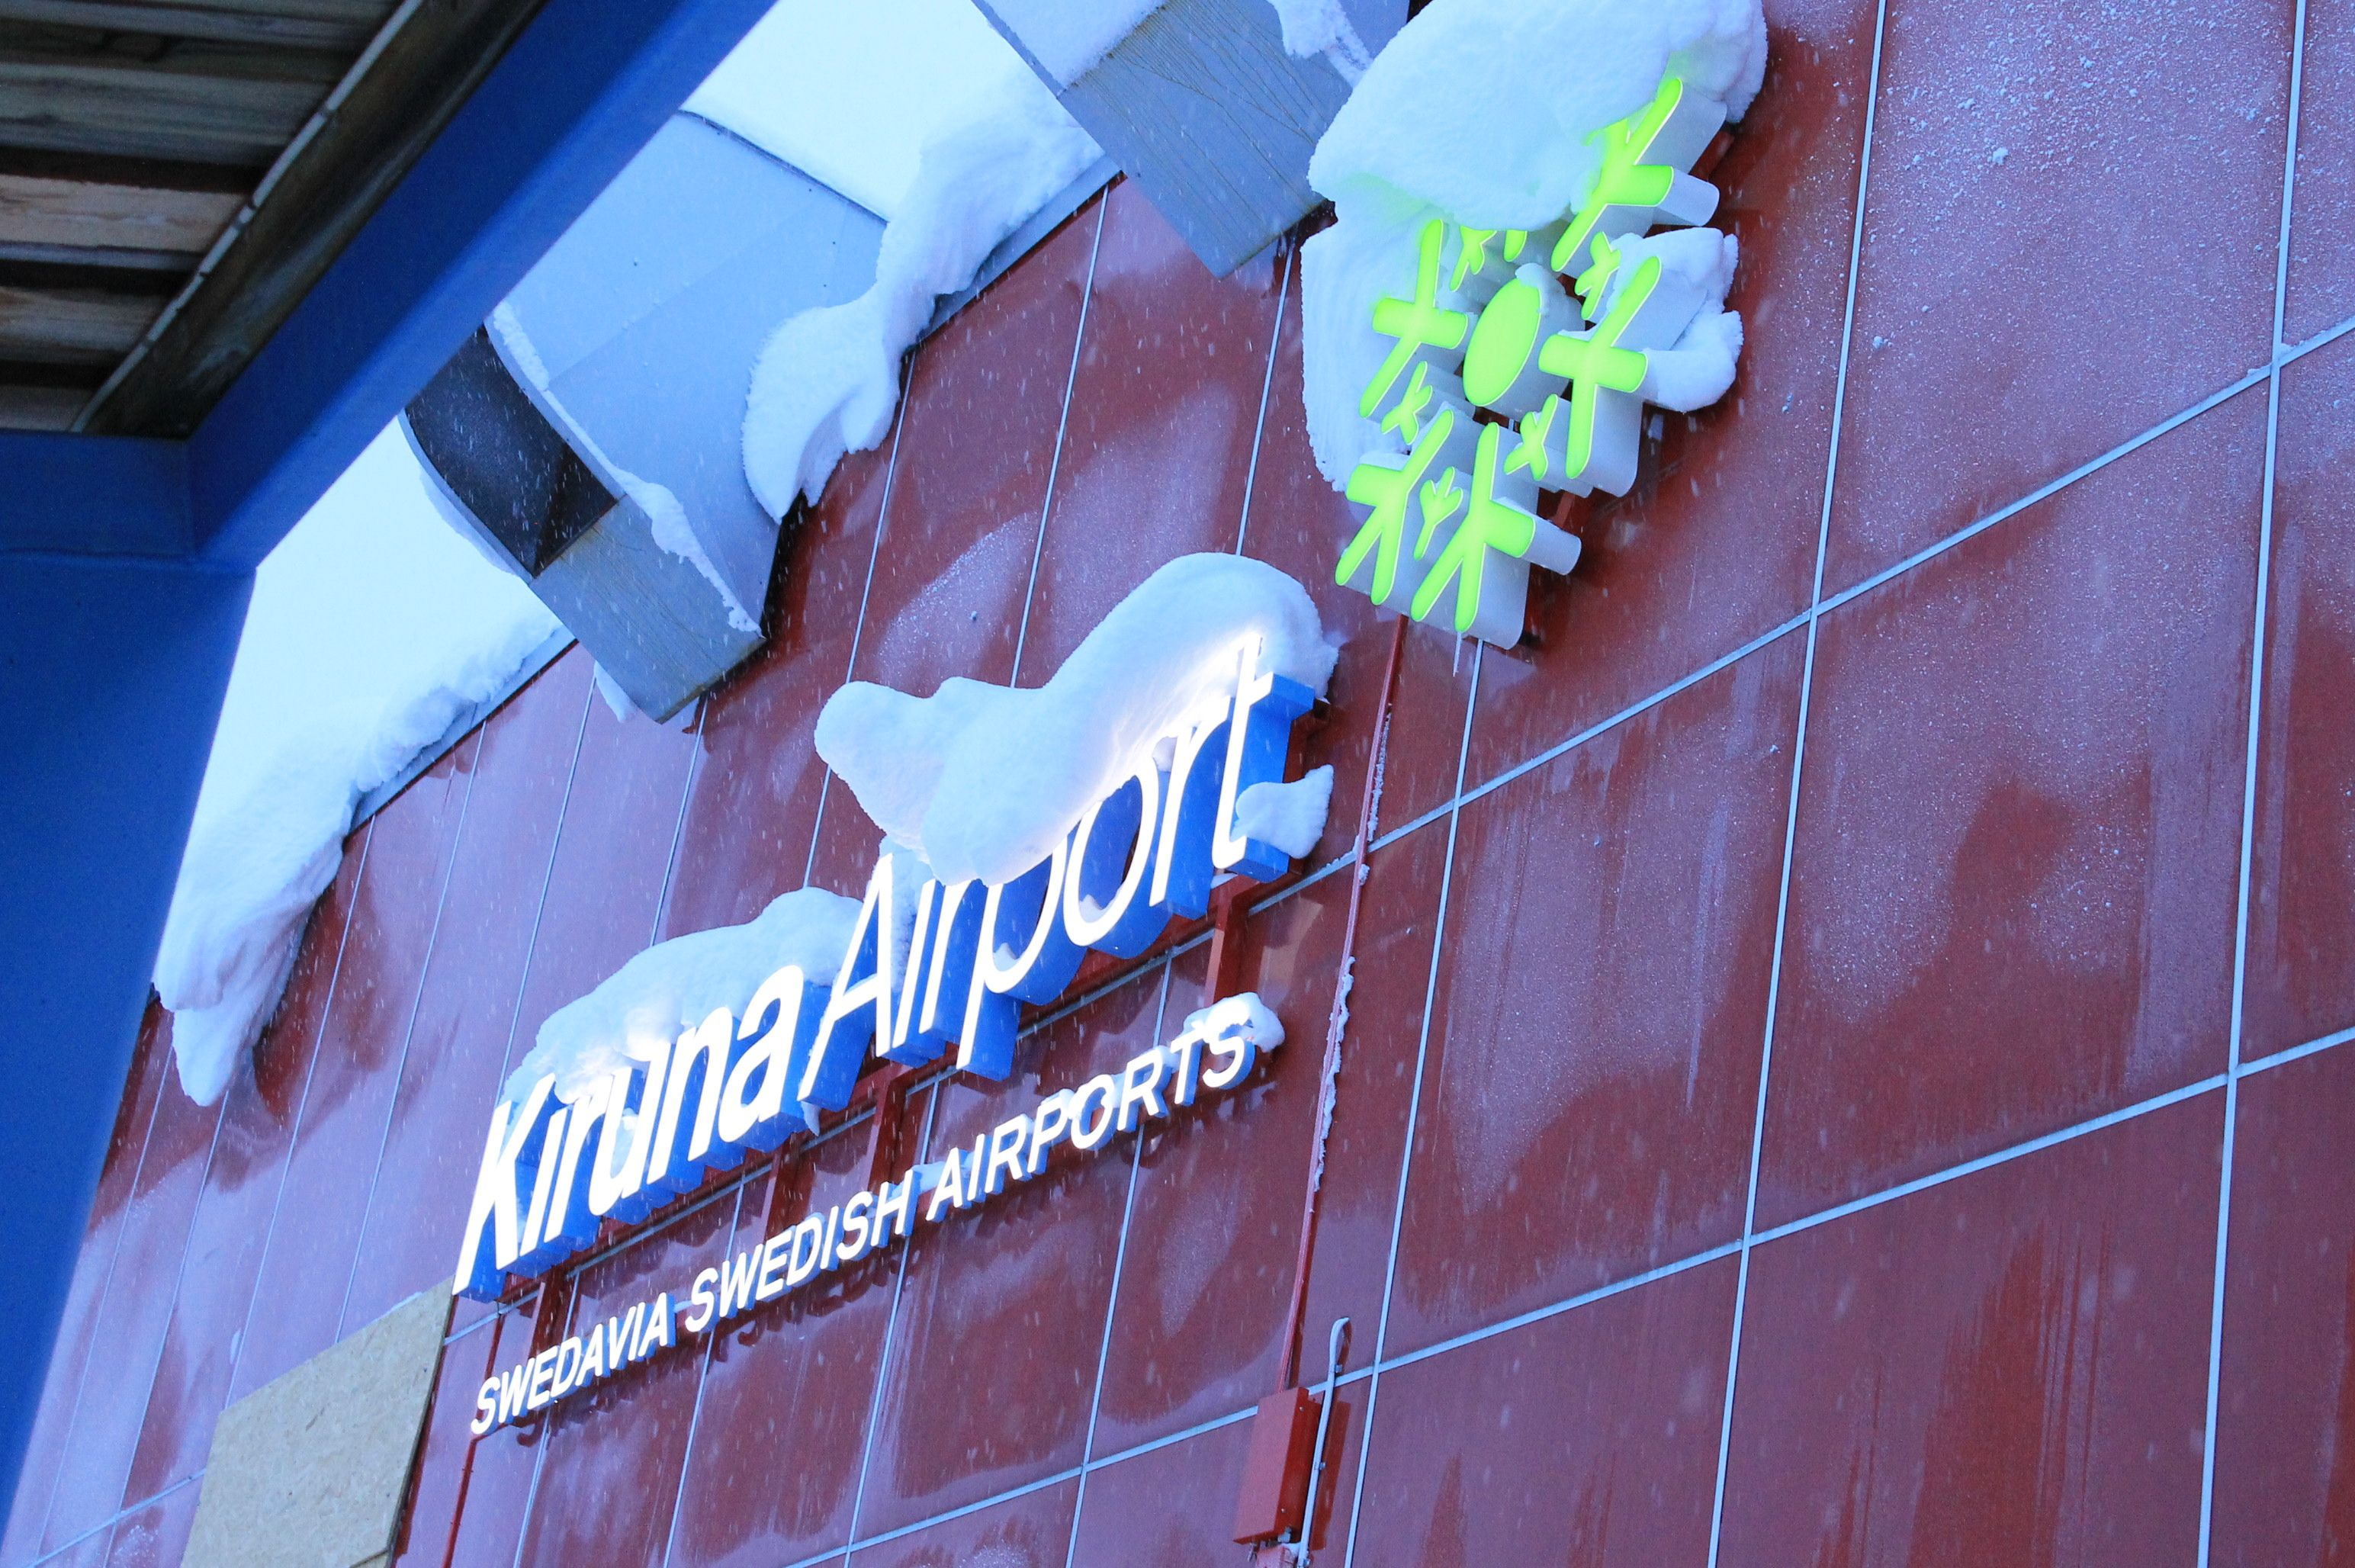 L'aeroporto - The airport (Mary Attardi, Kiruna)